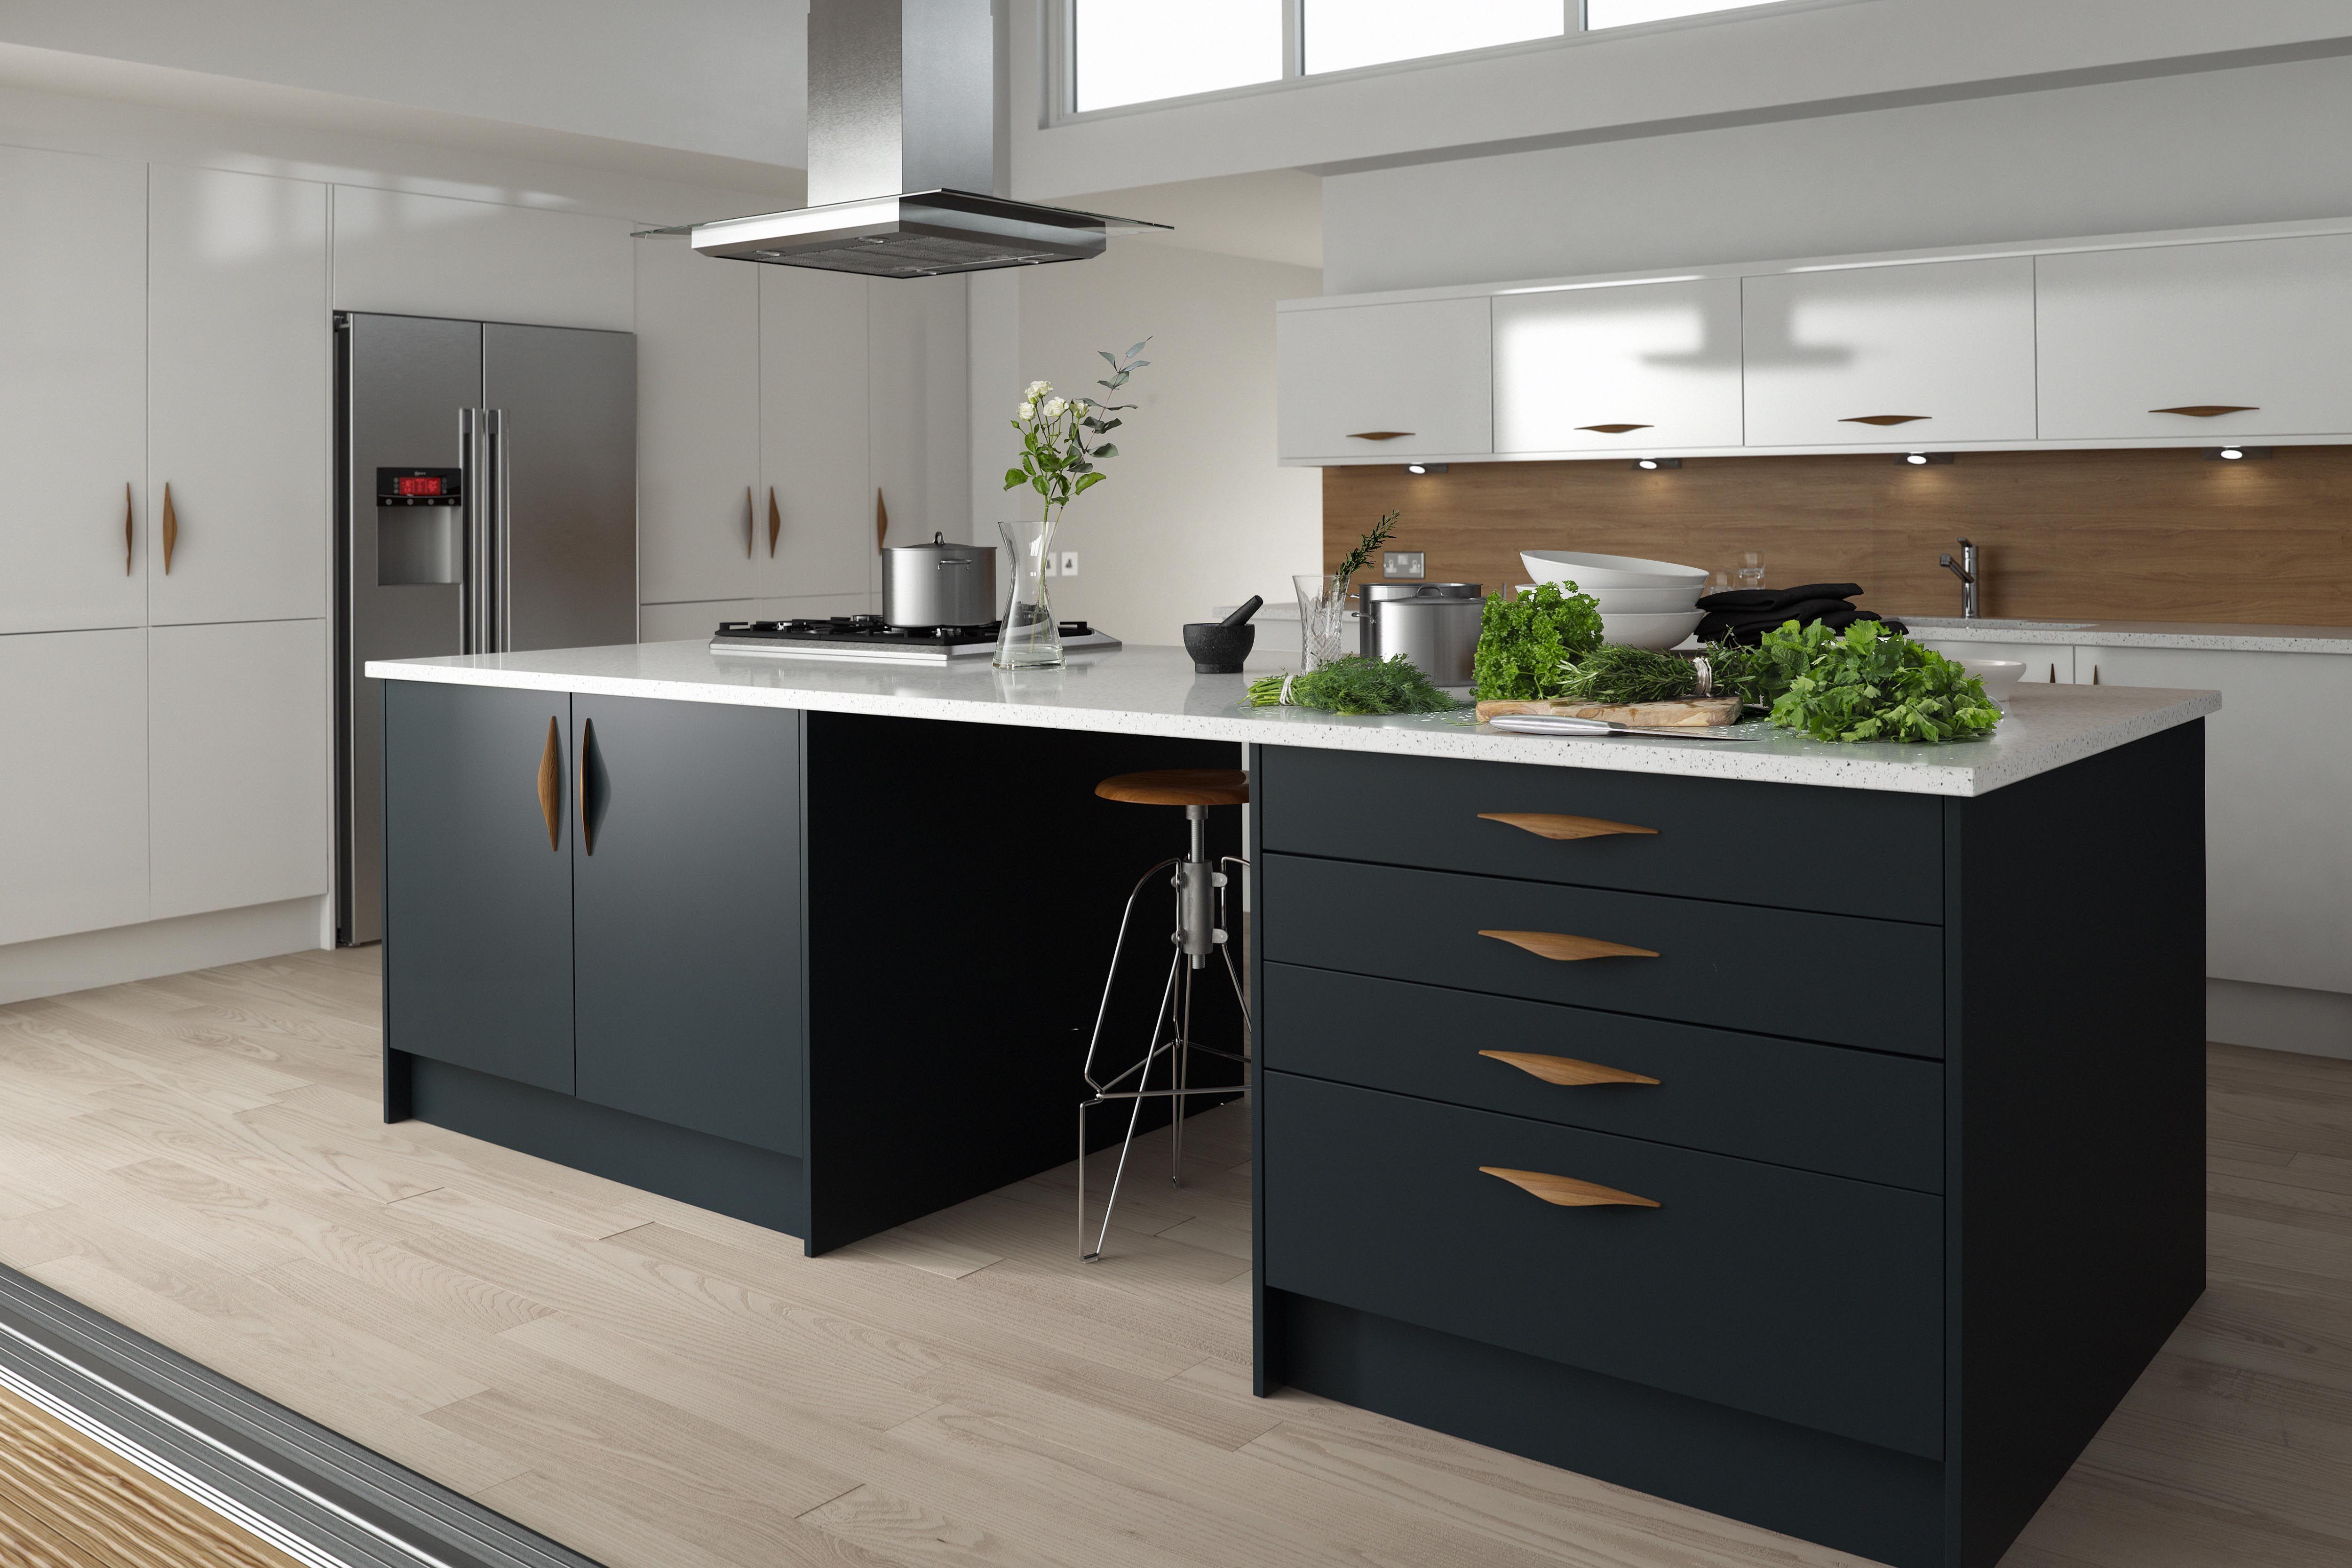 grey matte kitchen with copper handles google search kitchen grey matte kitchen with copper handles google search